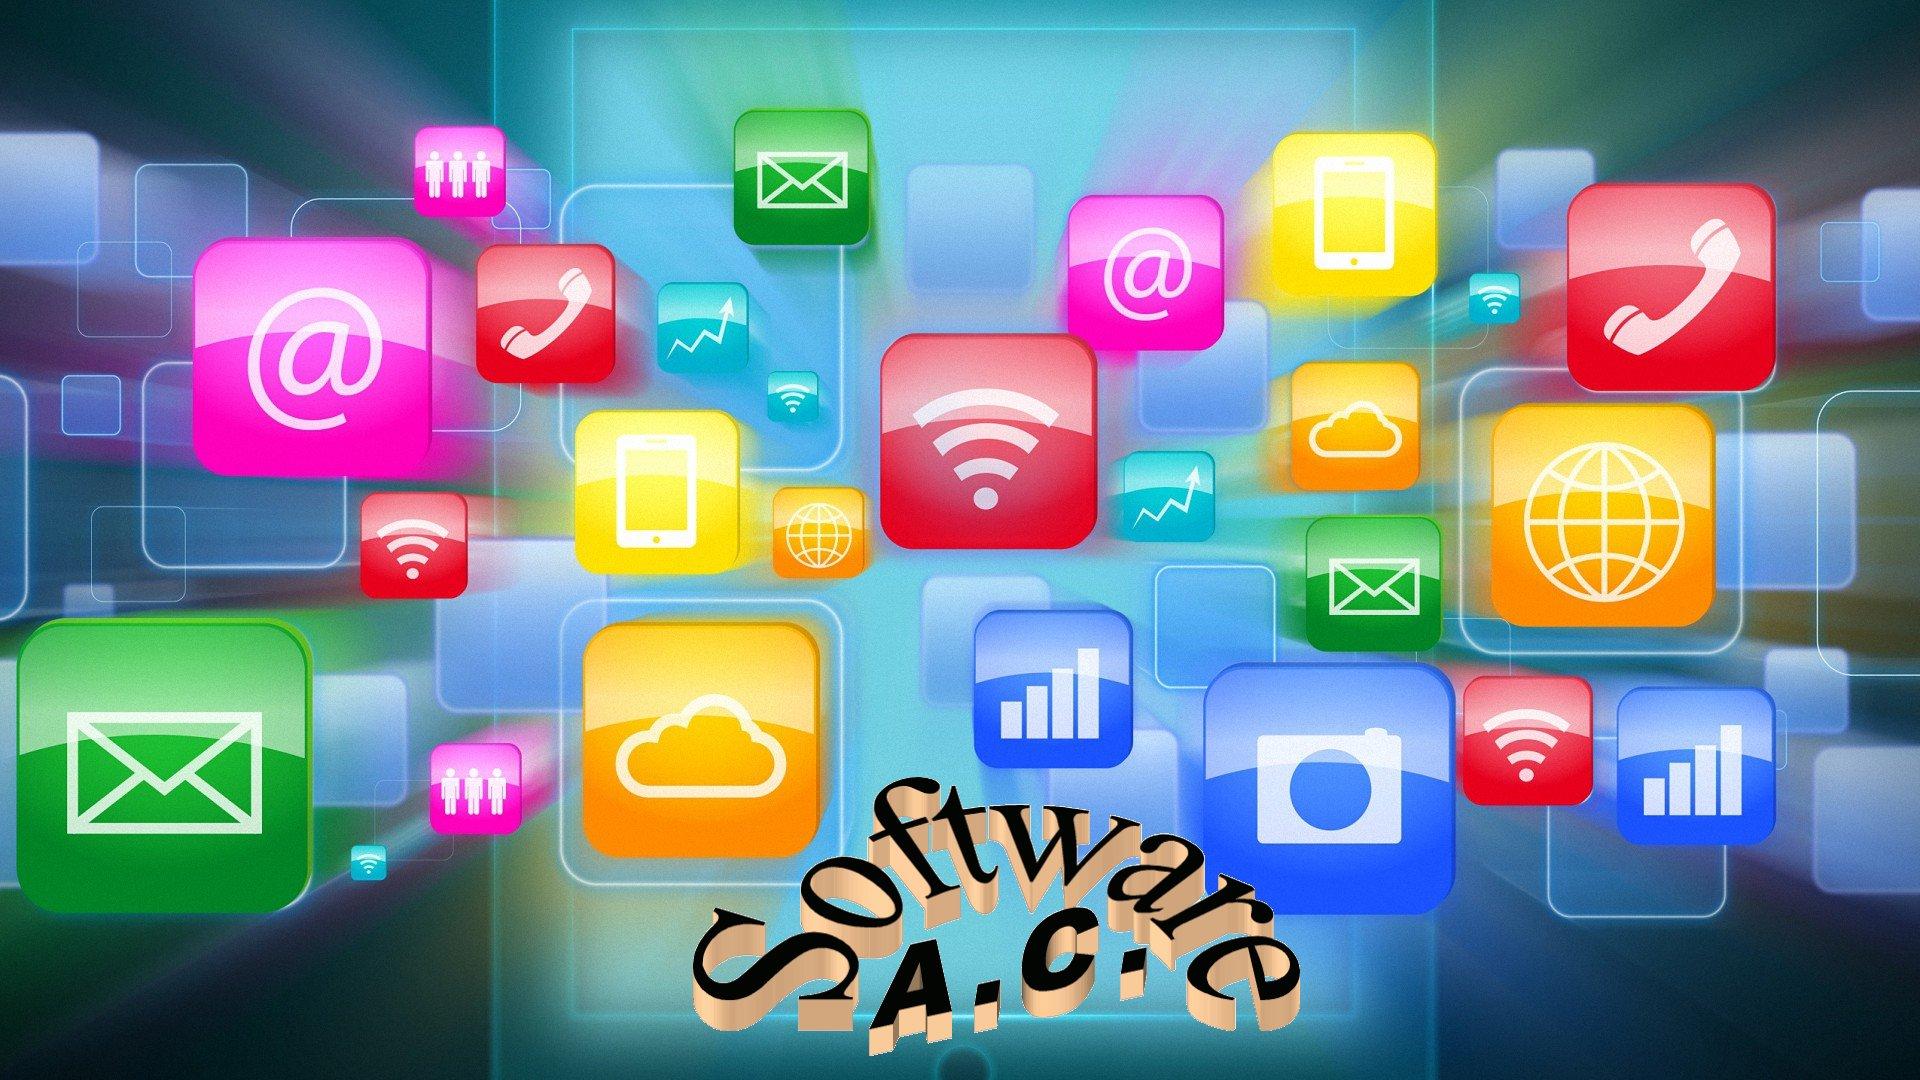 A.C. Software